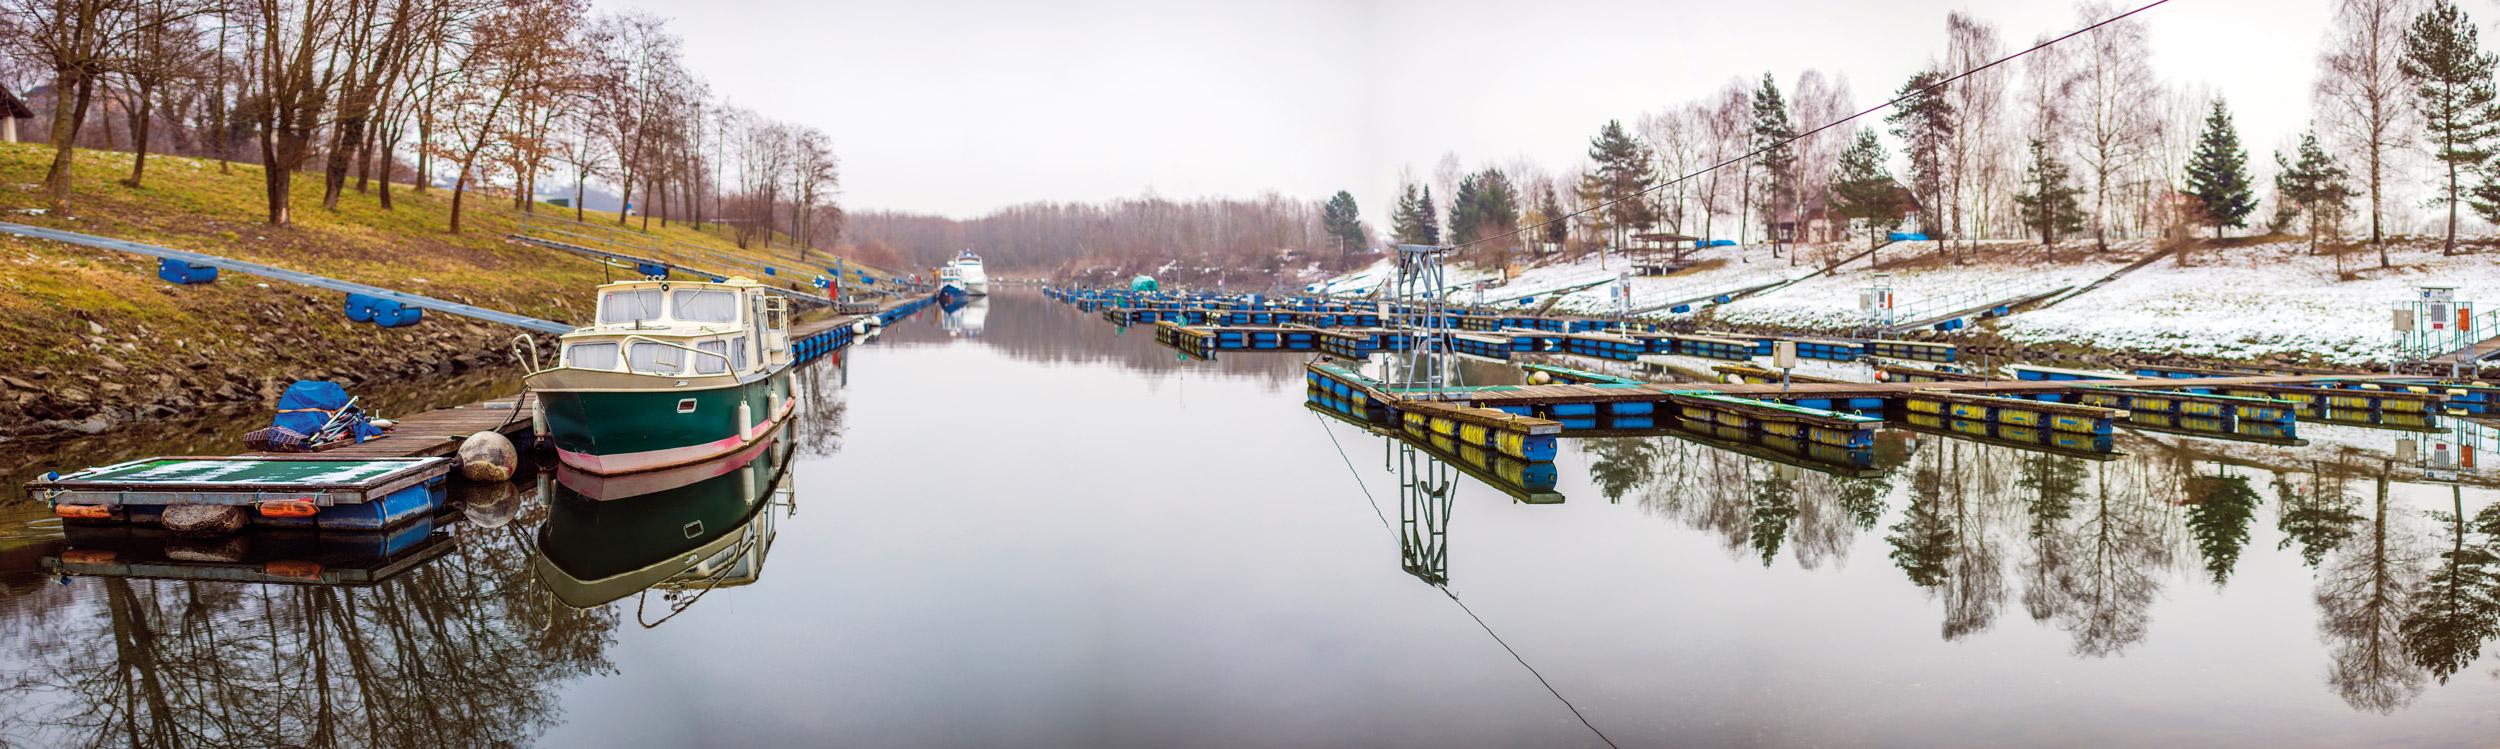 Hafen Luberegg